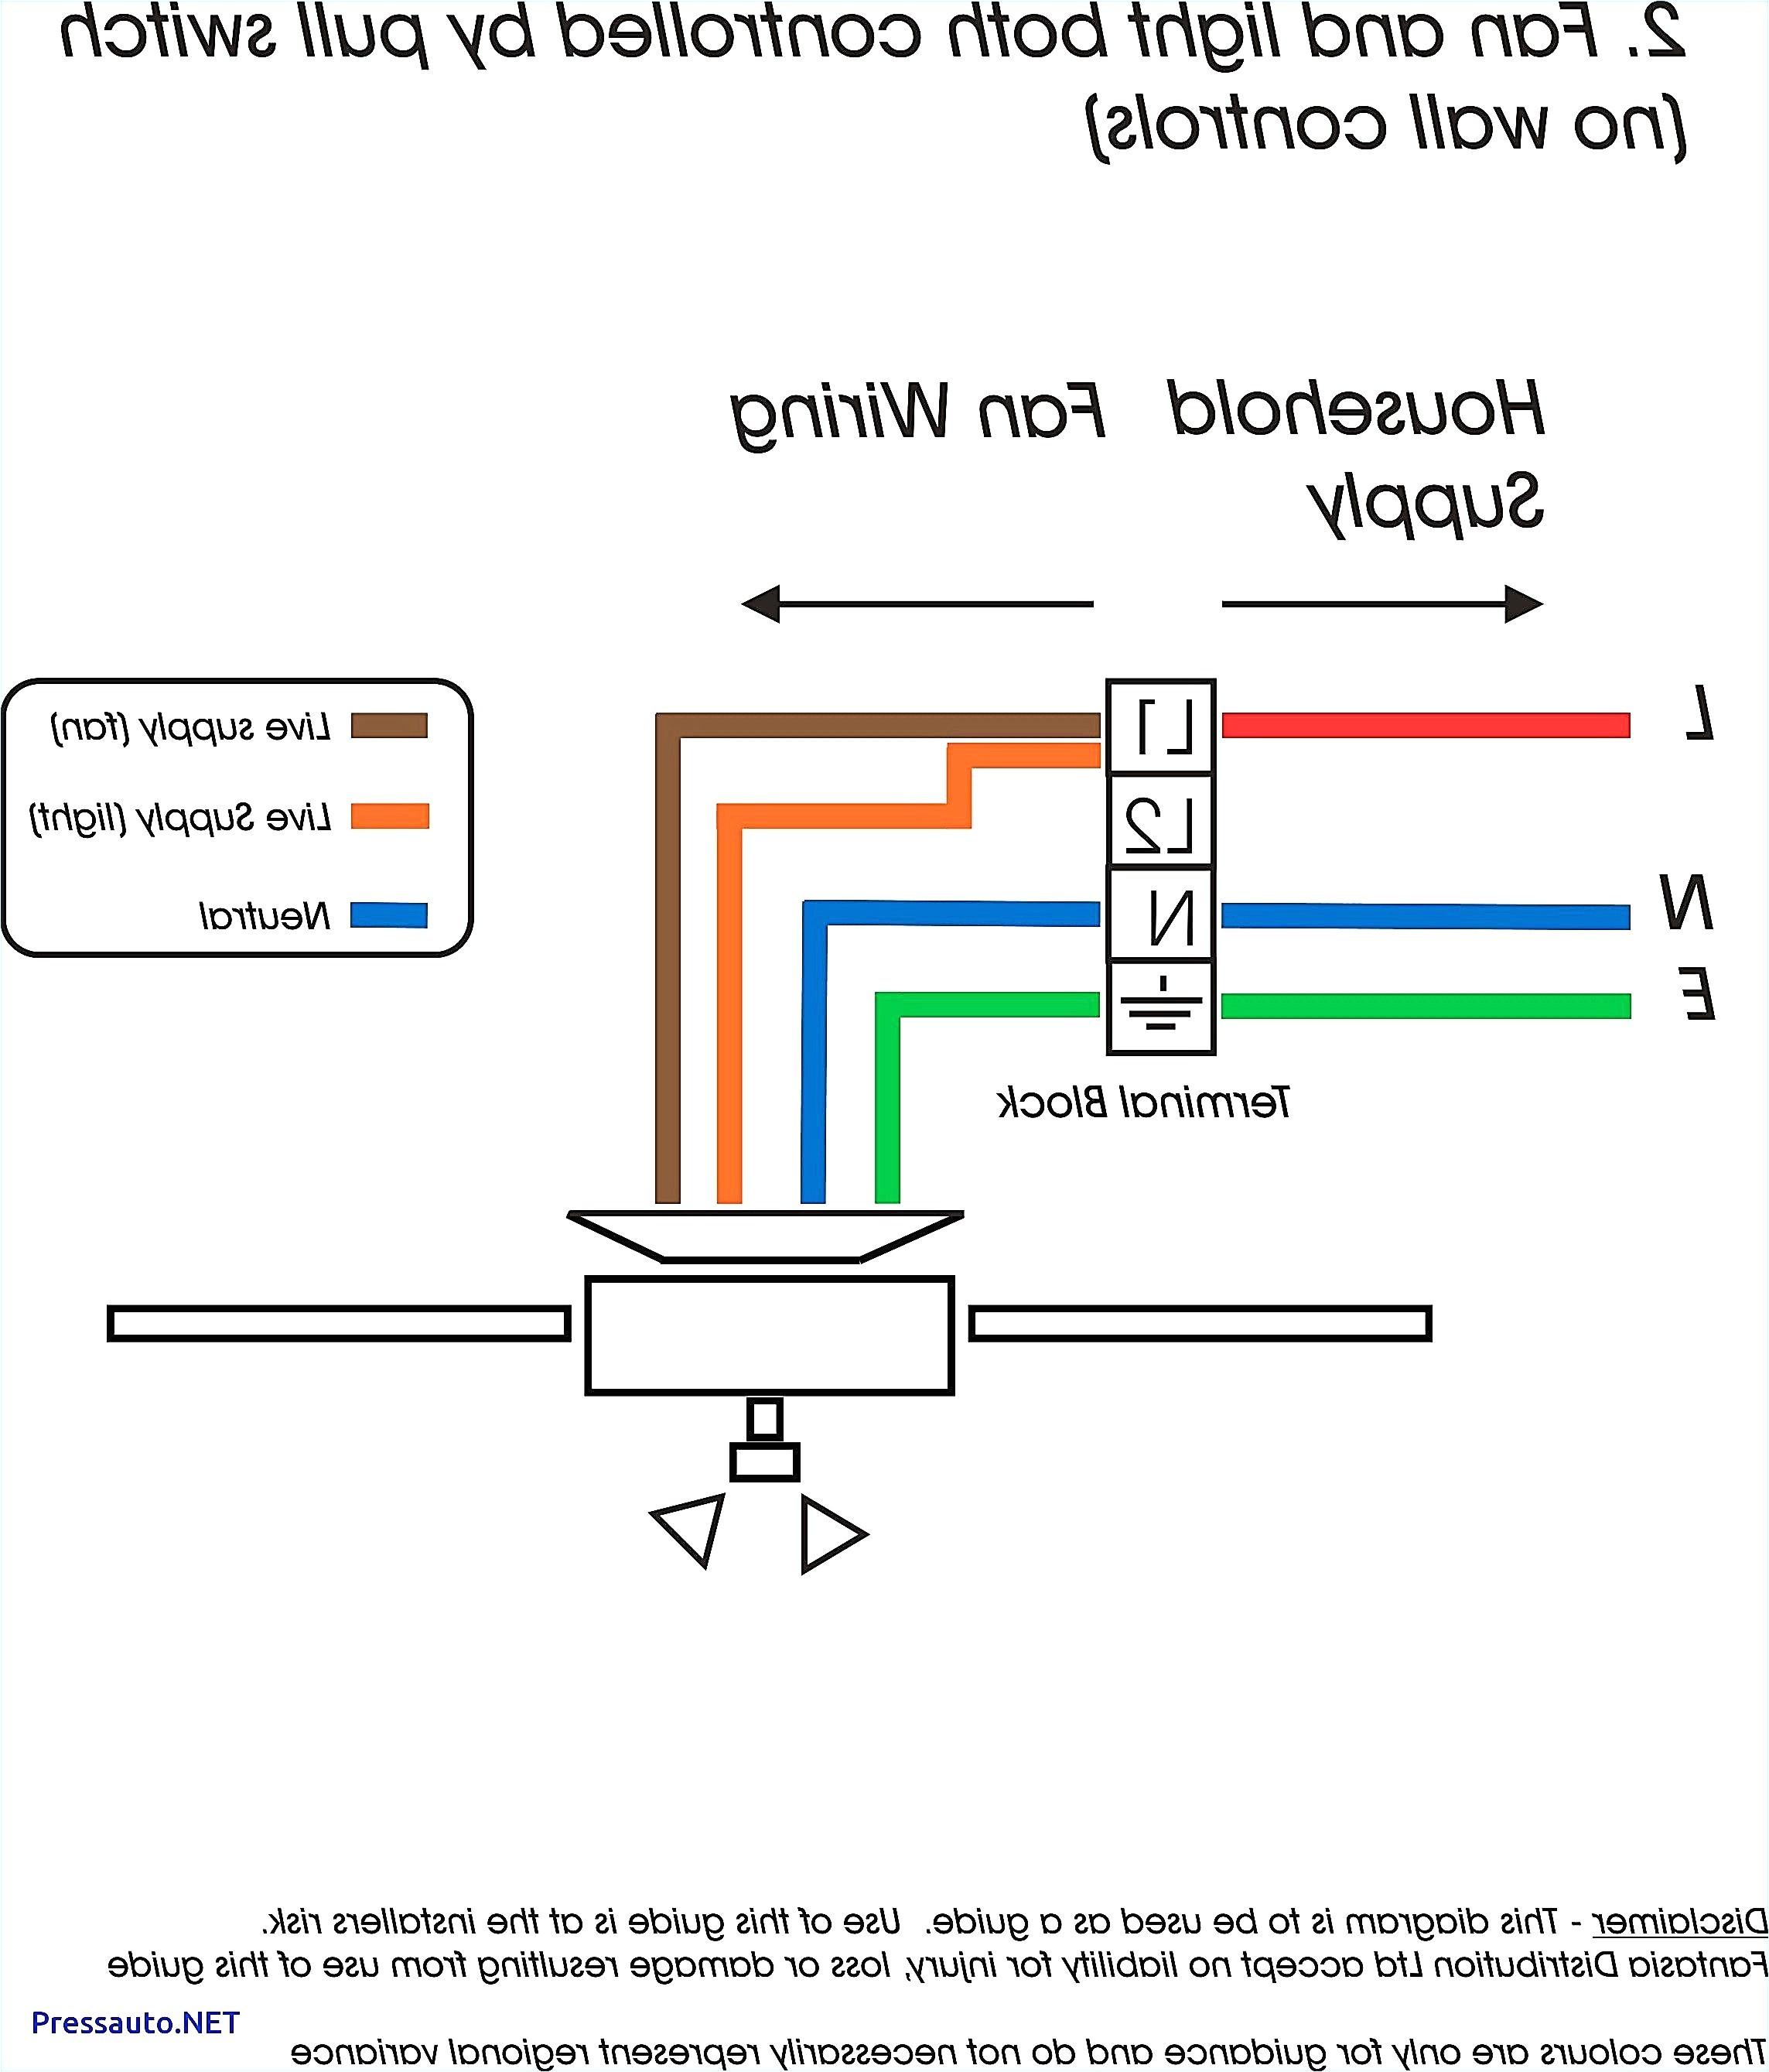 fahrenheat thermostat wiring diagram wiring diagram 240v baseboard heater thermostat best baseboard of fahrenheat thermostat wiring diagram jpg